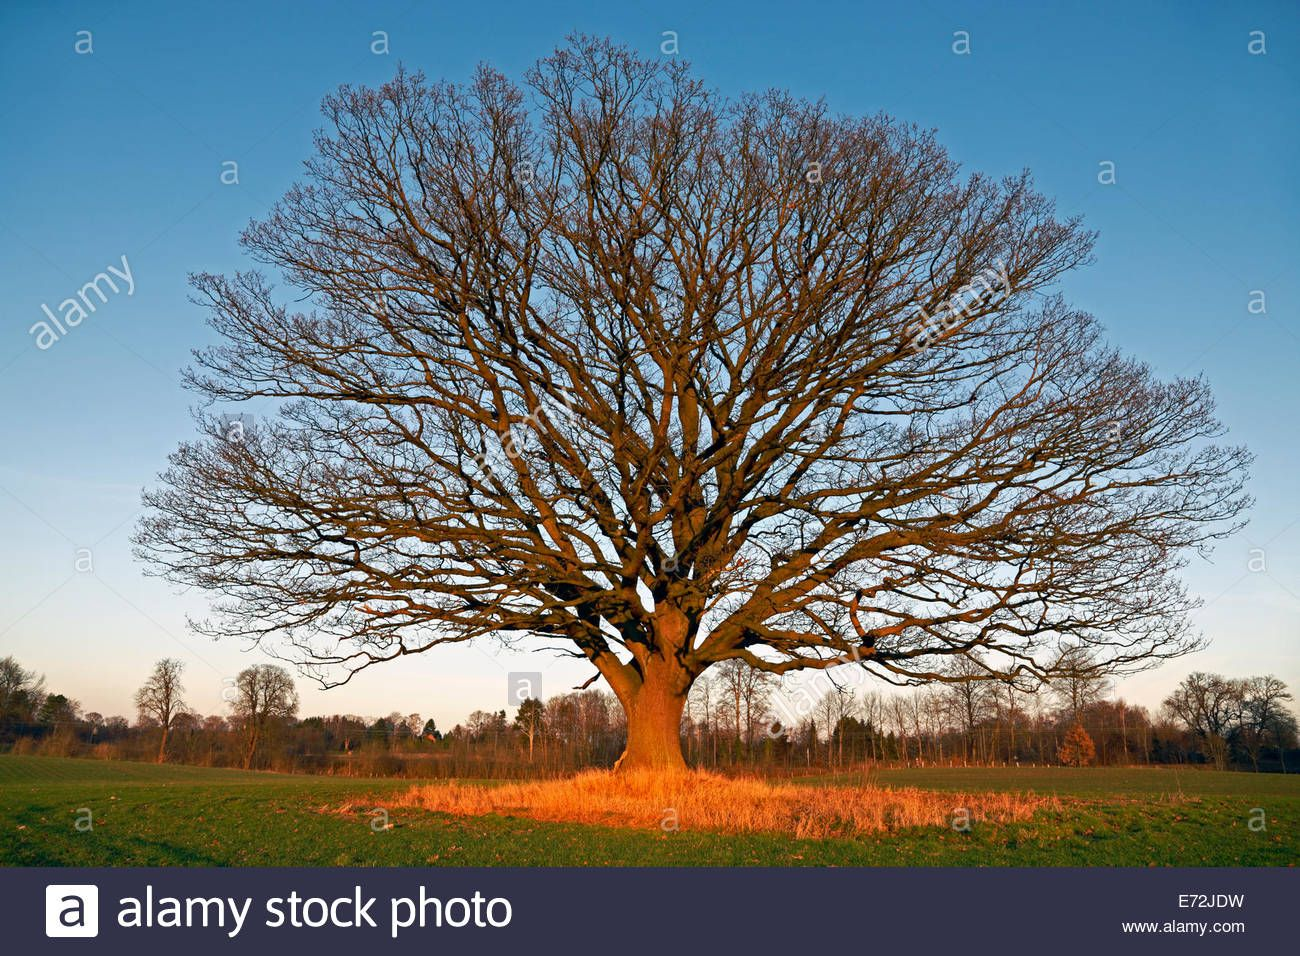 Big Old Oak Tree Common Oak English Oak Quercus Robur With